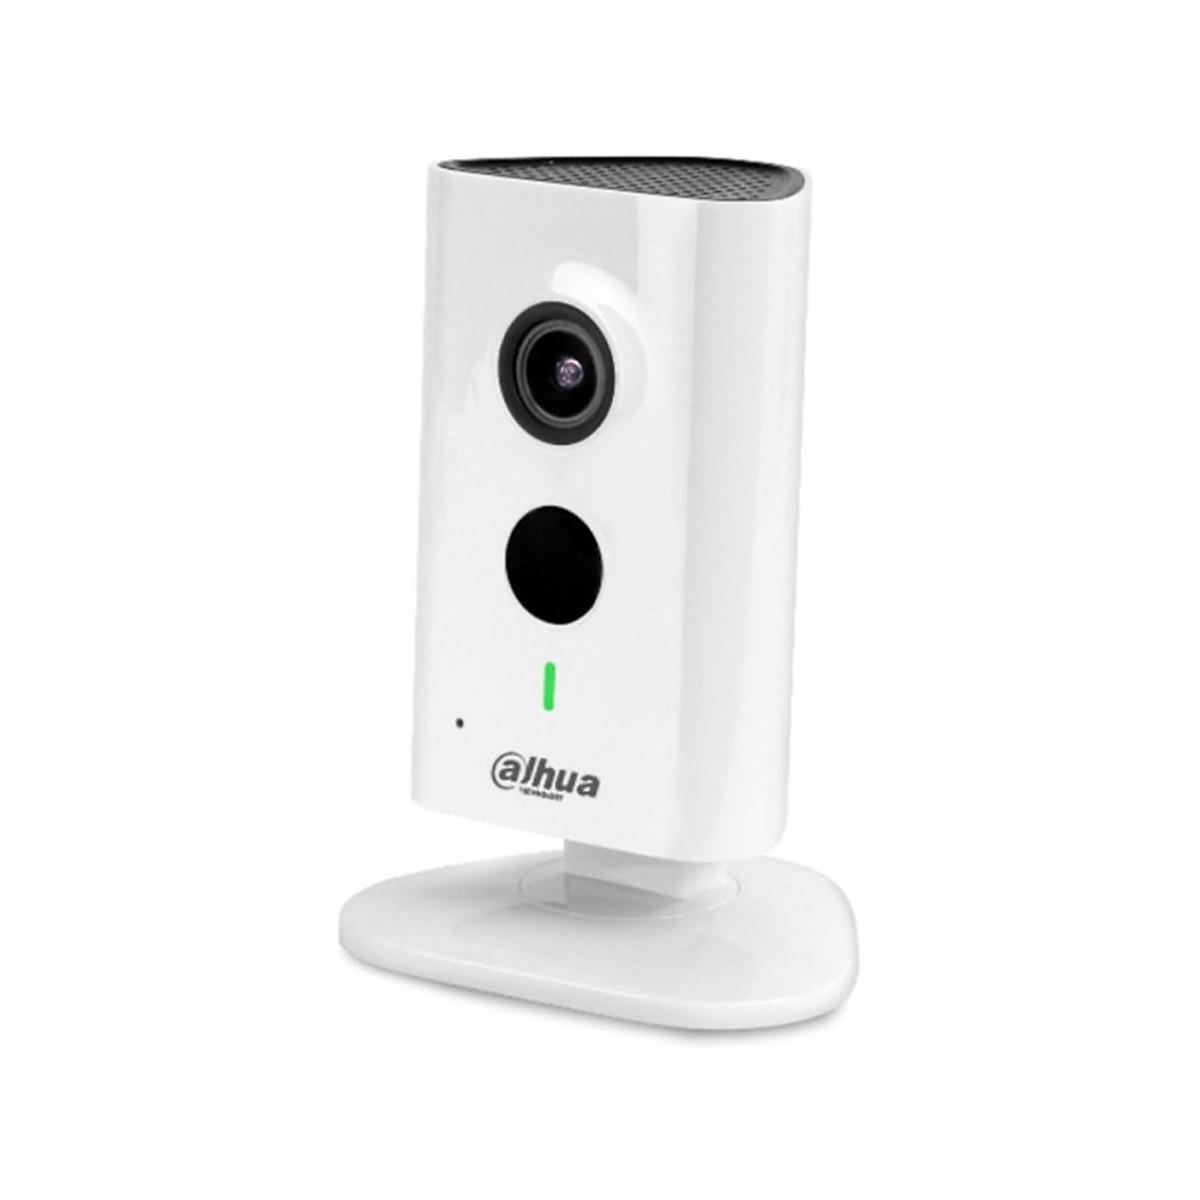 Camera IP Wifi DAHUA IPC-C15P 1.3 Megapixel – Chính Hãng